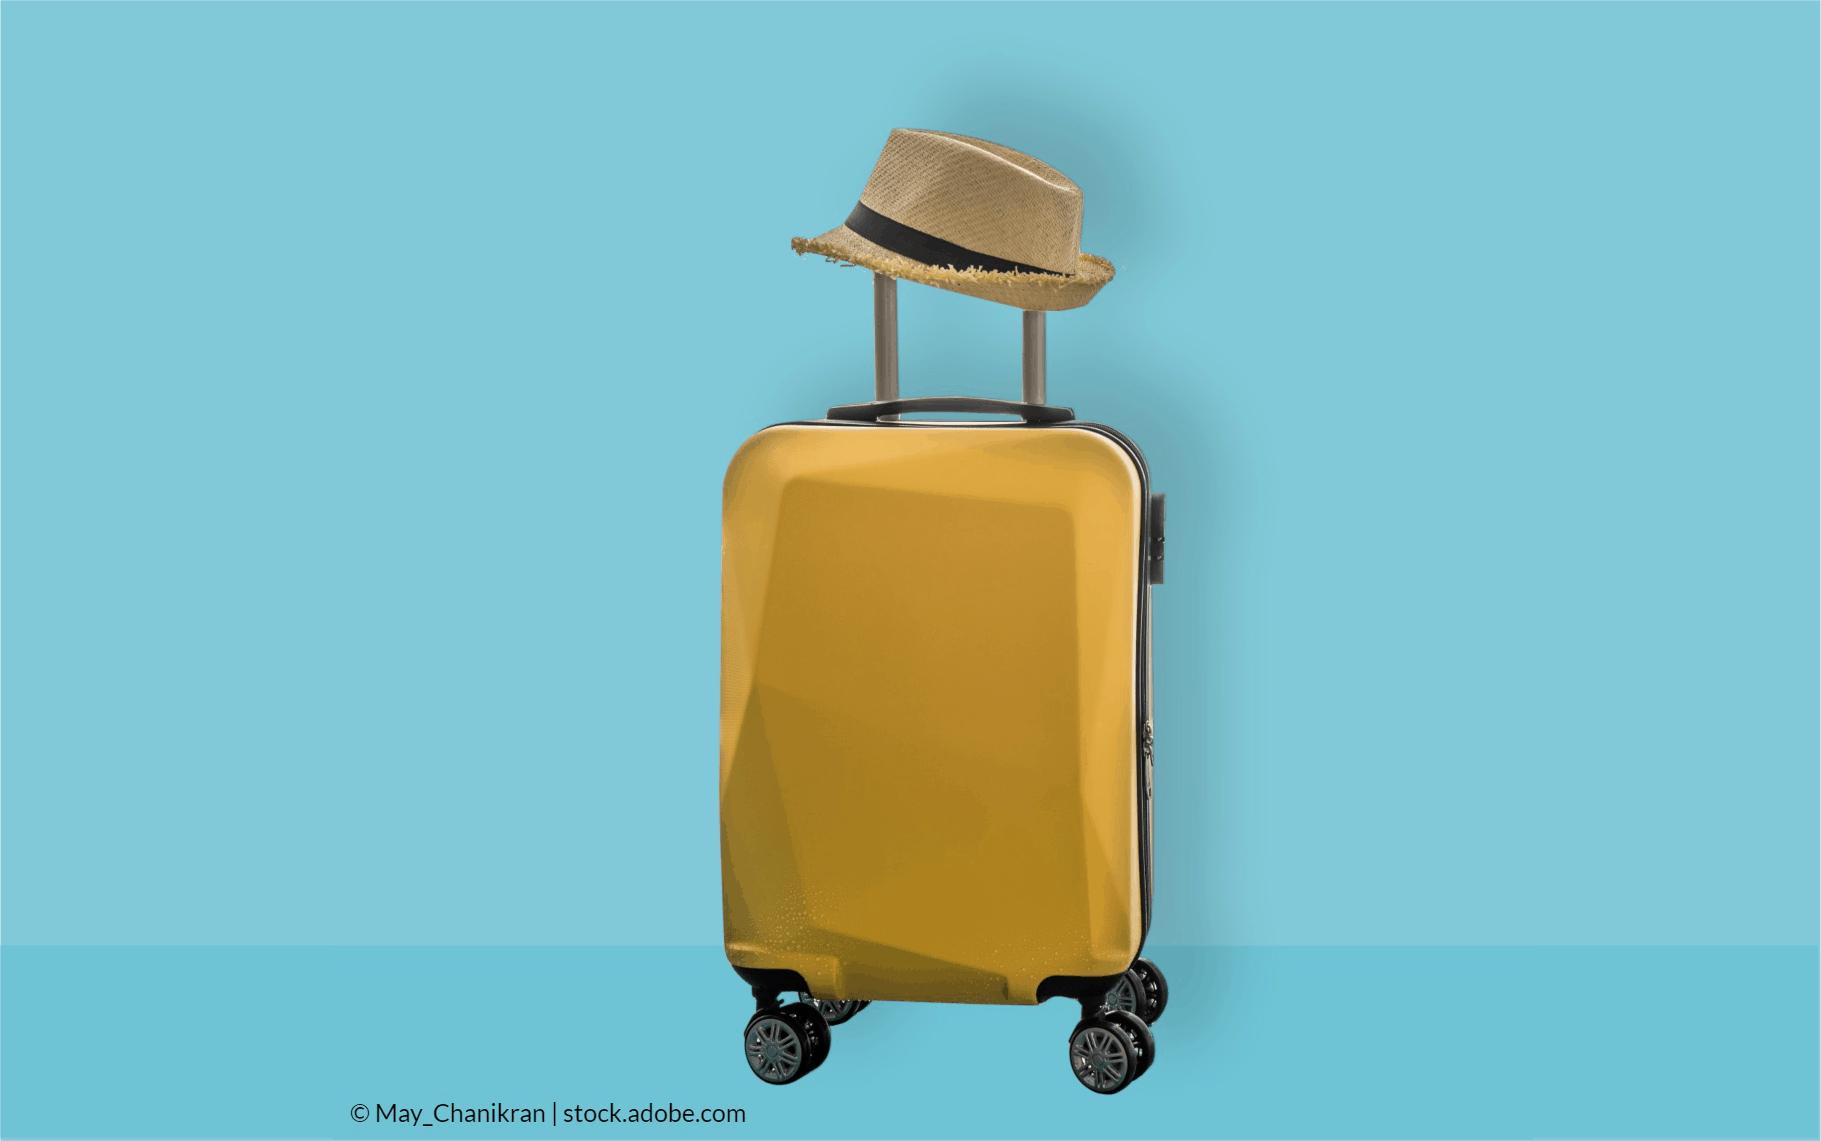 repară deformarile valizei